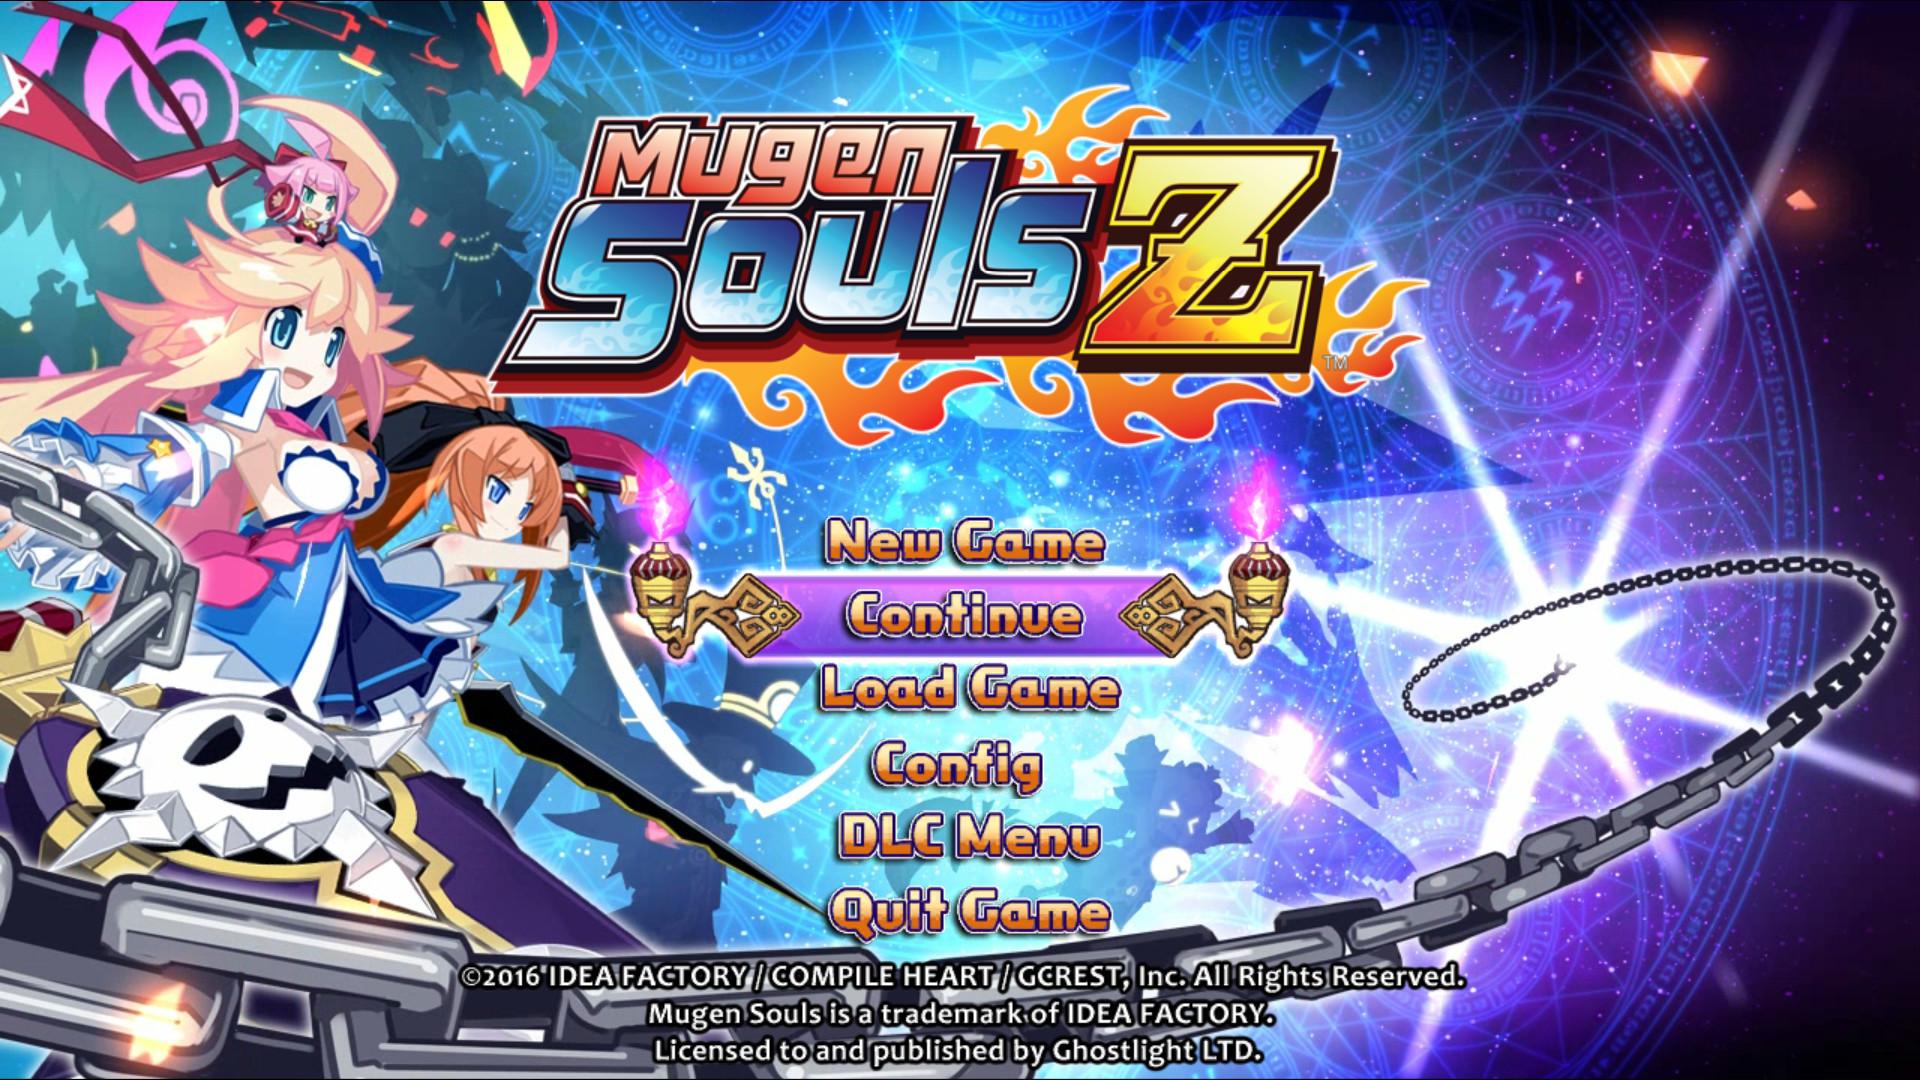 Mugen Souls Z: Overwhelming Weapon Bundle 2016 pc game Img-4